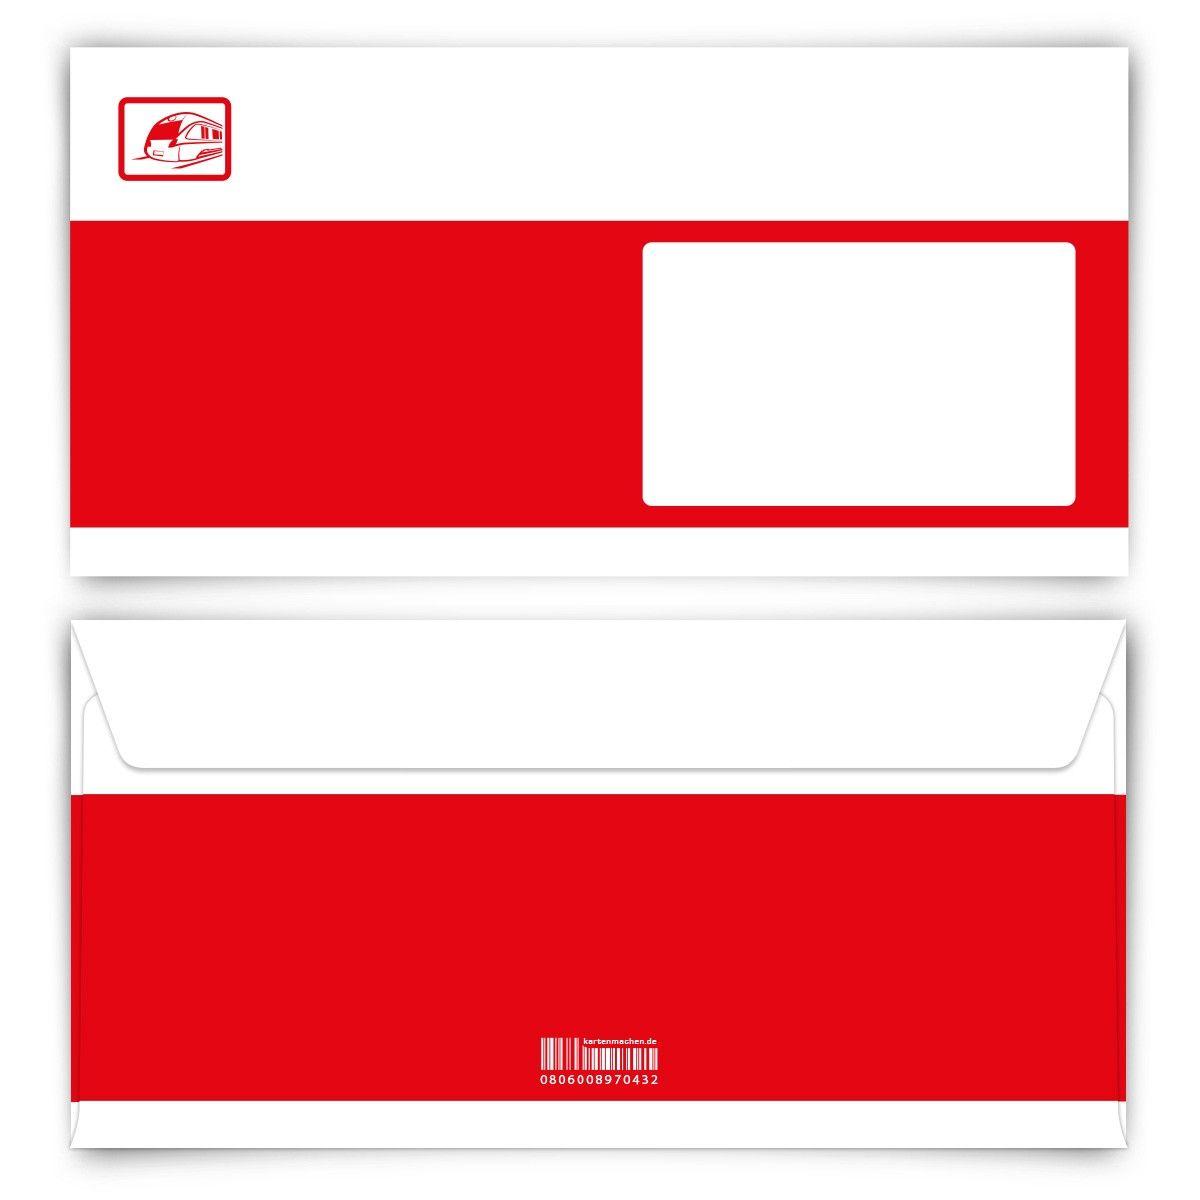 Bahncard Pin